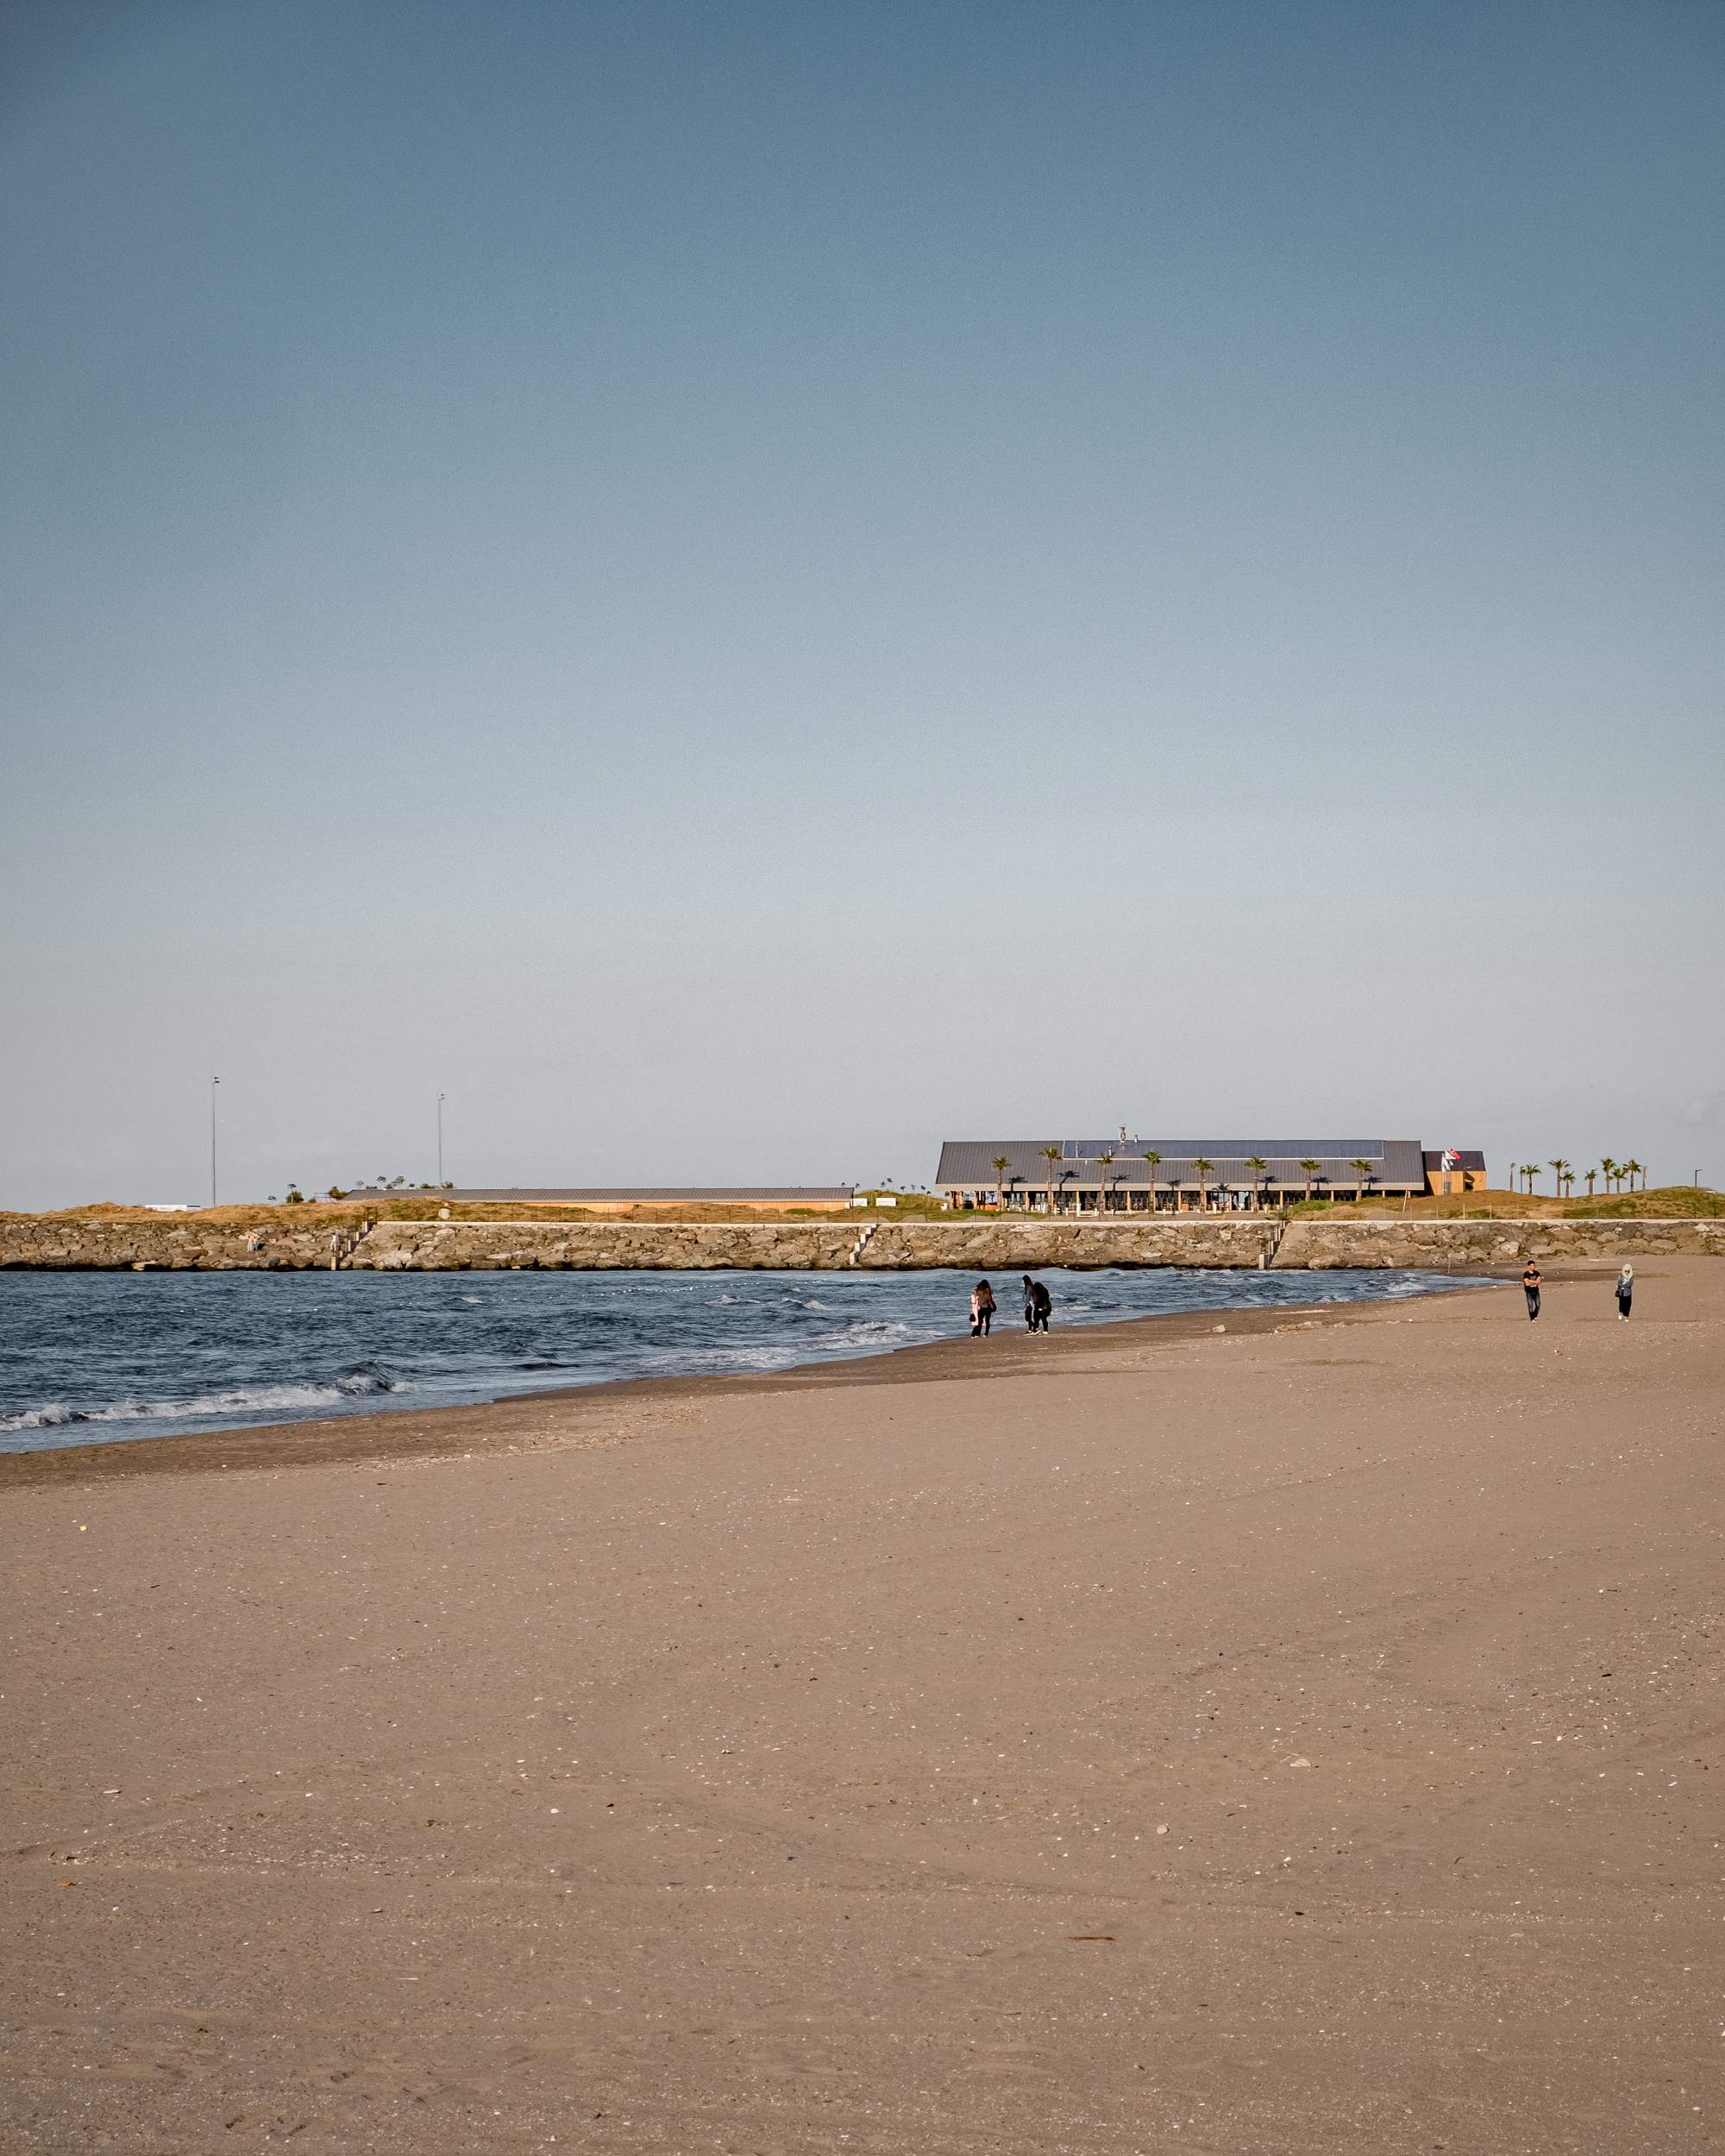 Гольф Клуб у побережья Чёрного моря, Турция